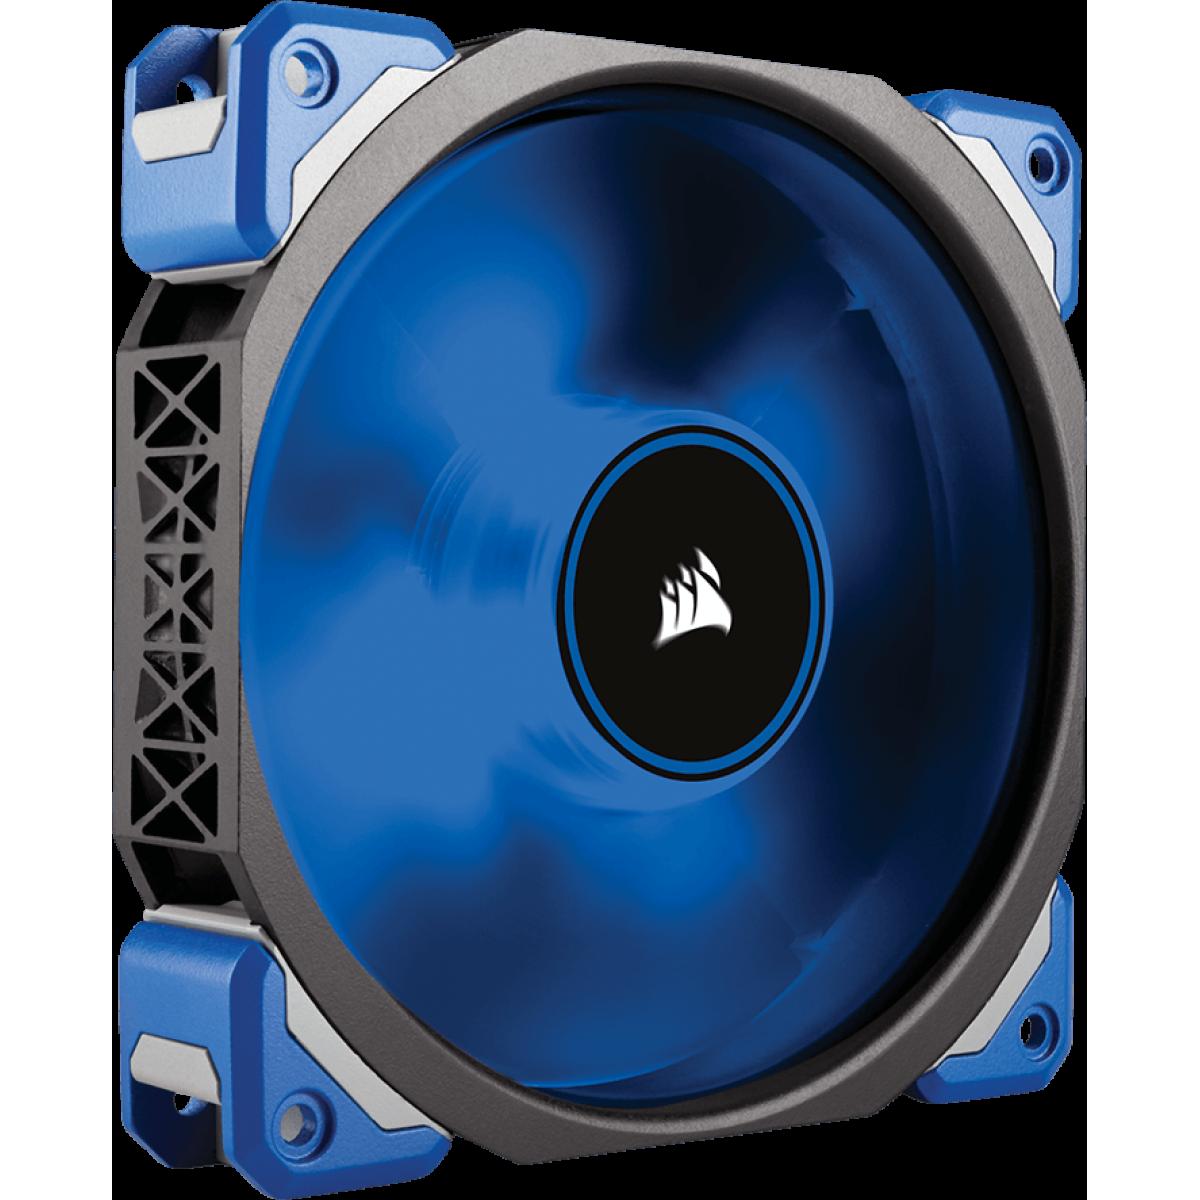 Cooler para Gabinete Corsair ML120 Pro Pwm, LED Blue 120mm, CO-9050043-WW